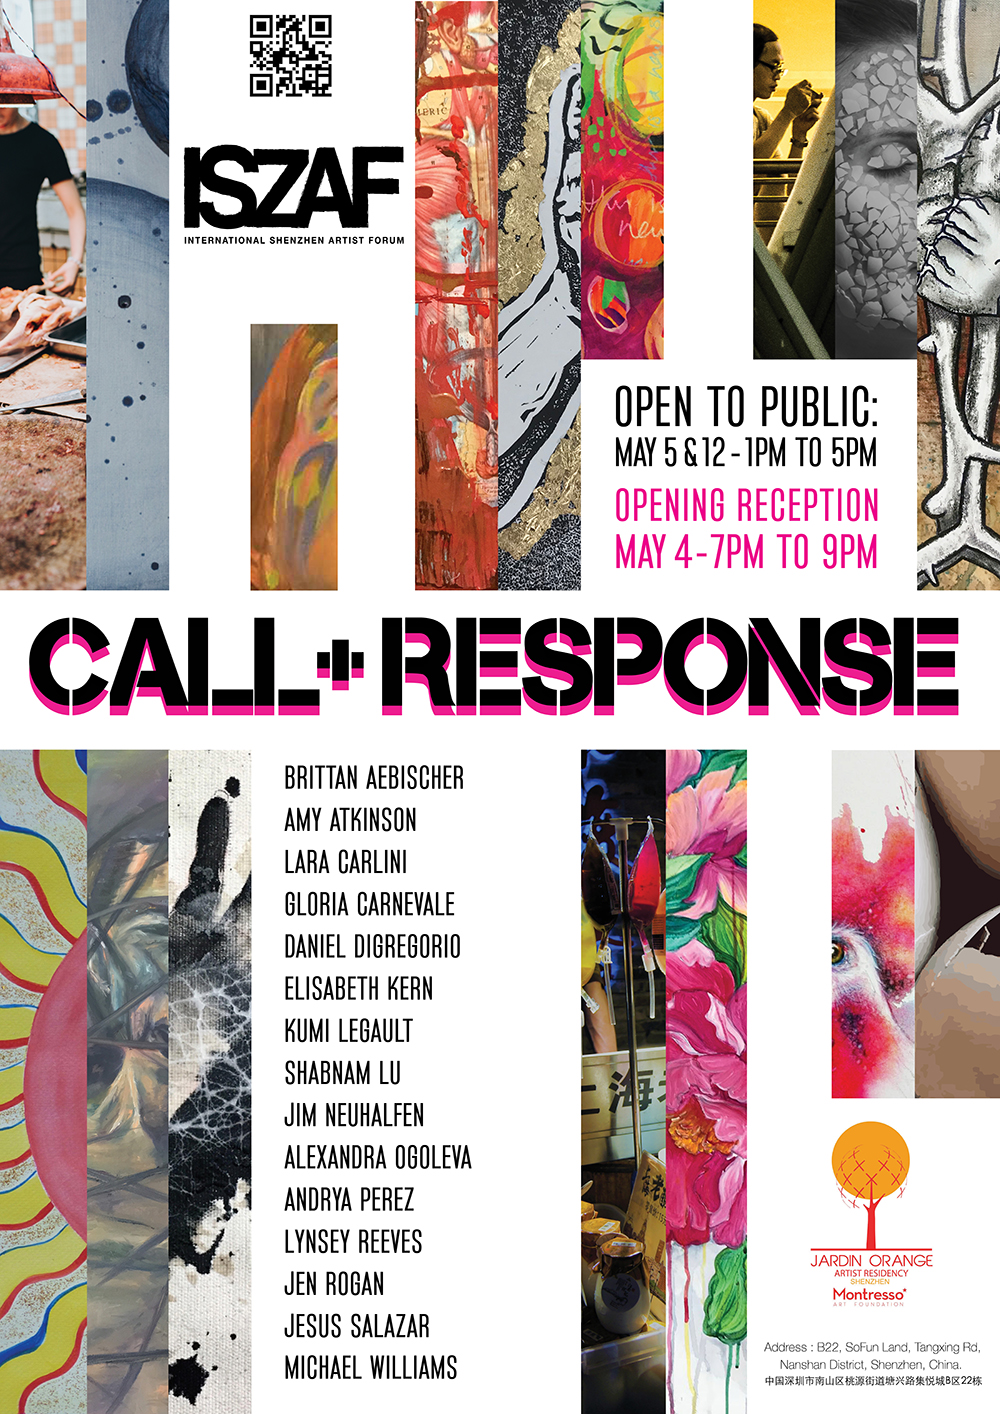 Call + Response Exhibition Poster. 2018.